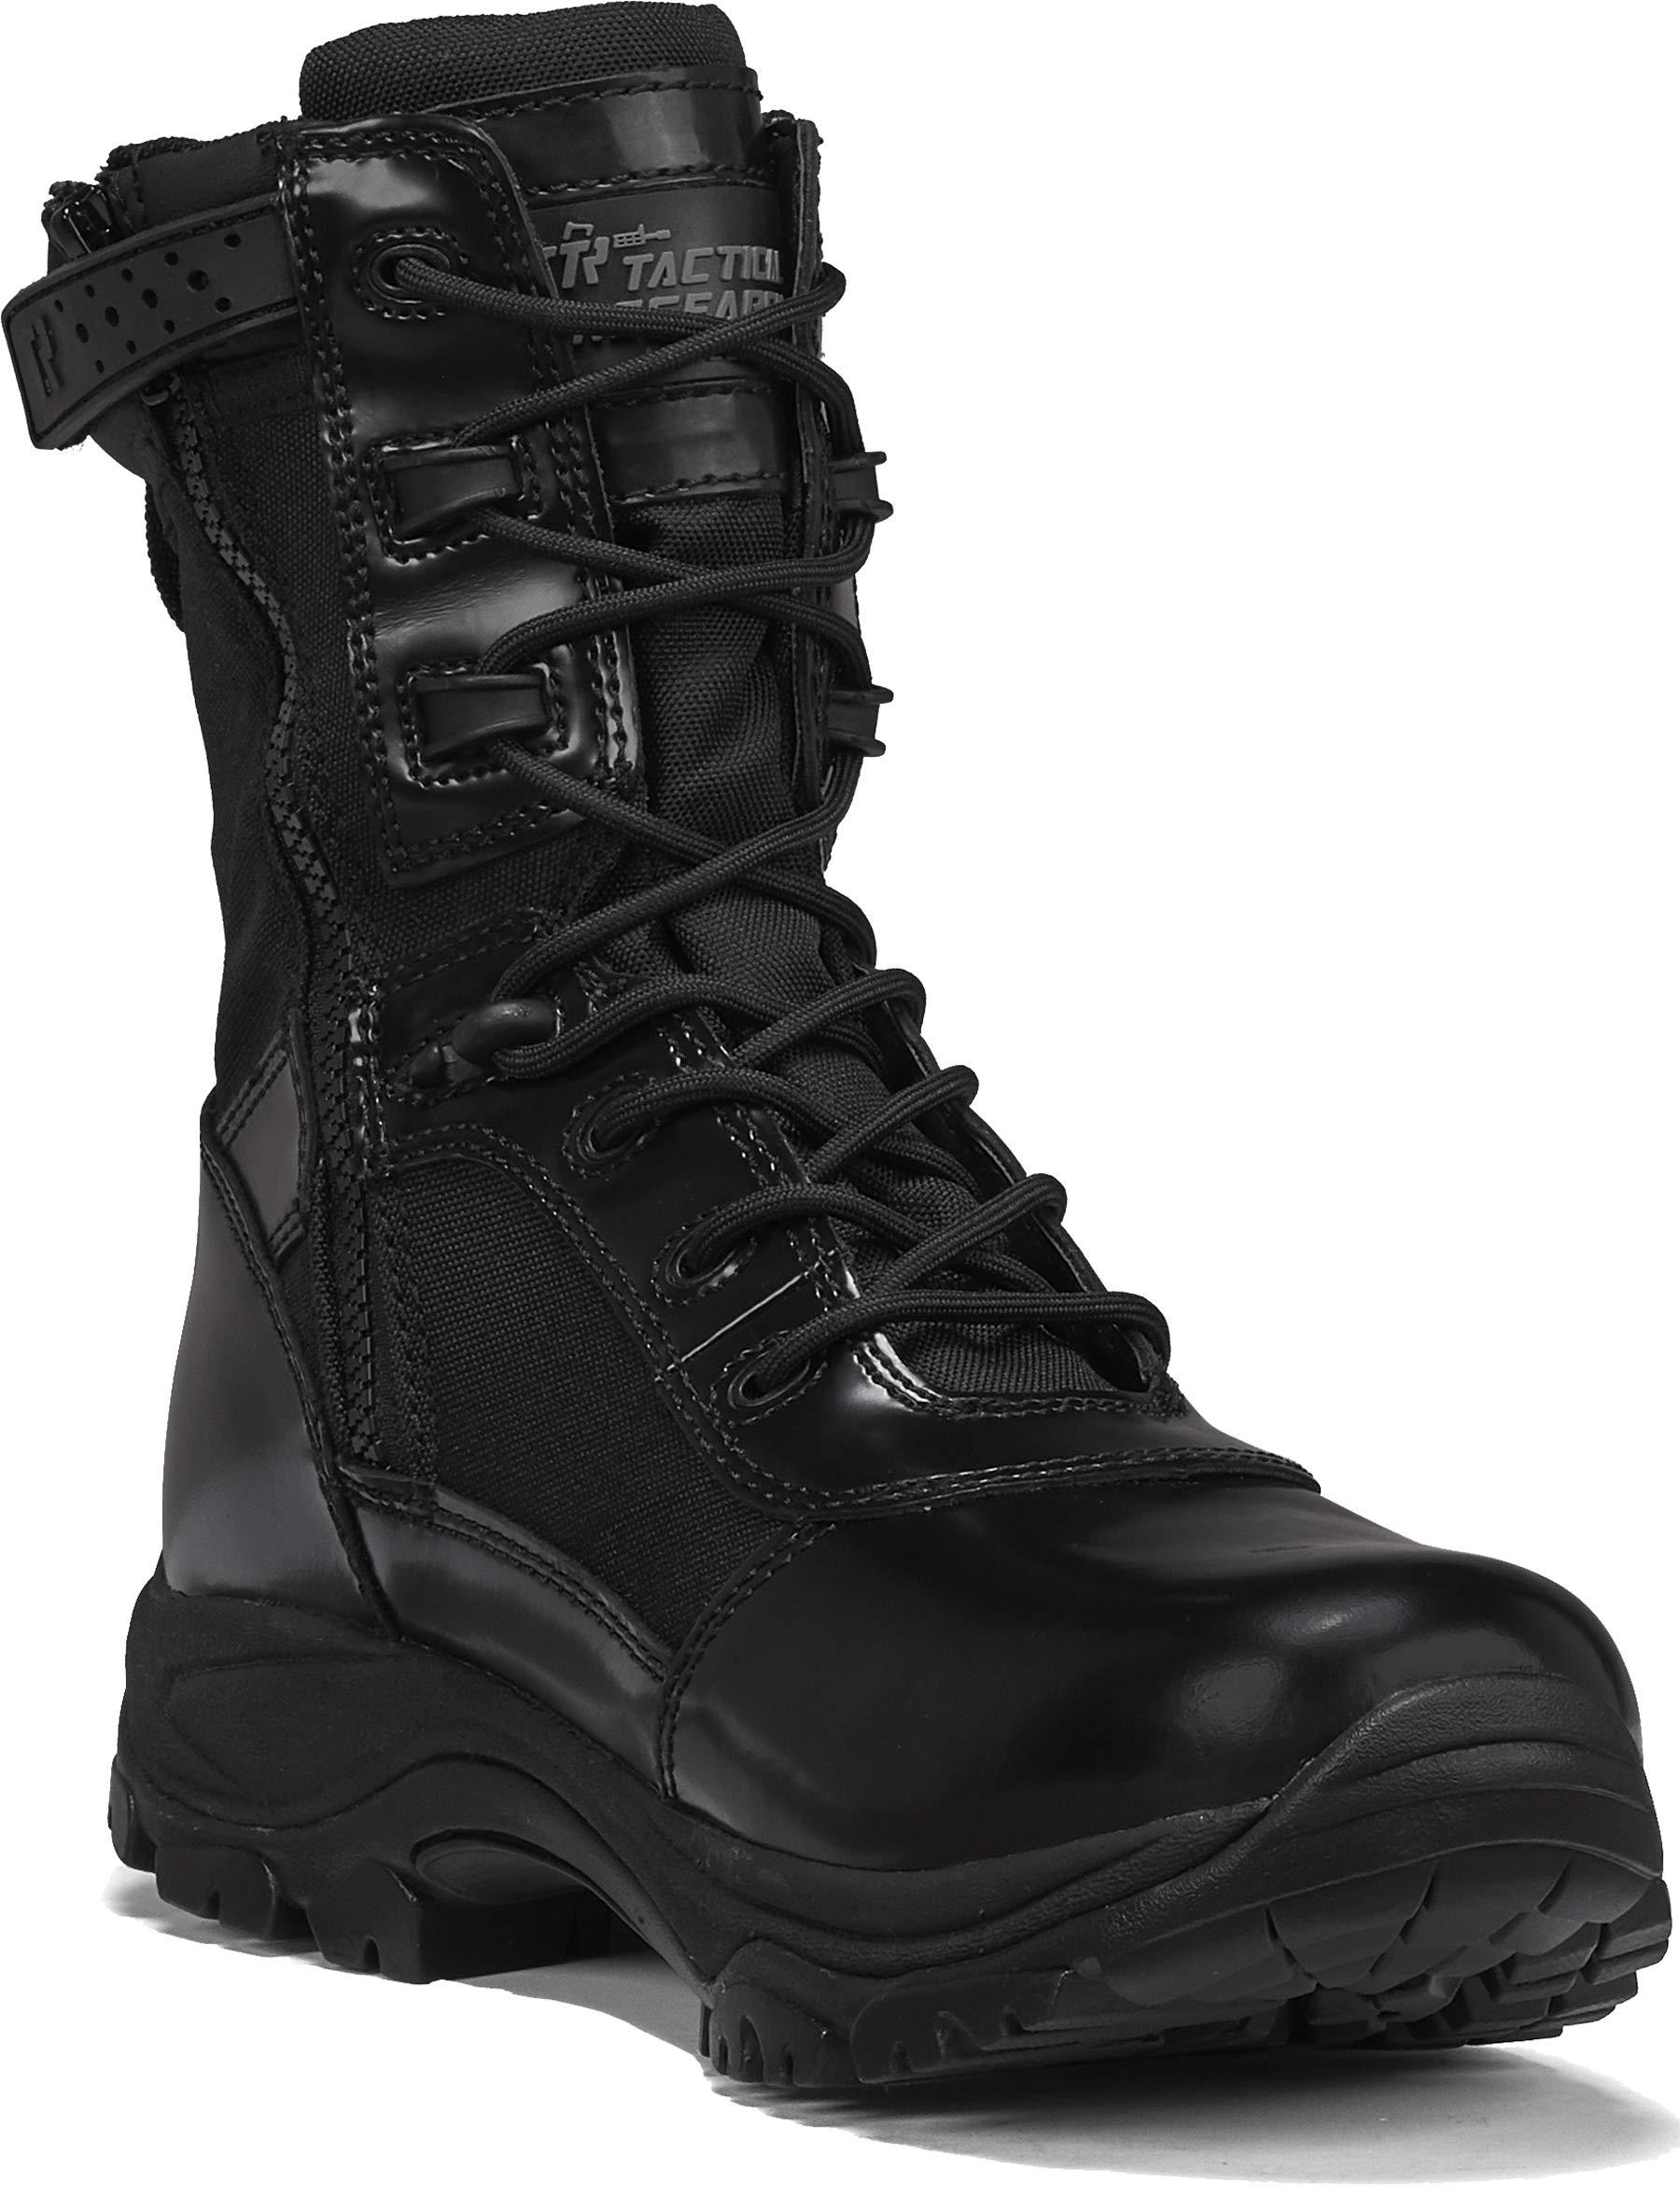 "TACTICAL RESEARCH TR Men's Class-A TR908Z WP 8"" Waterproof High Shine Side-Zip Boot"